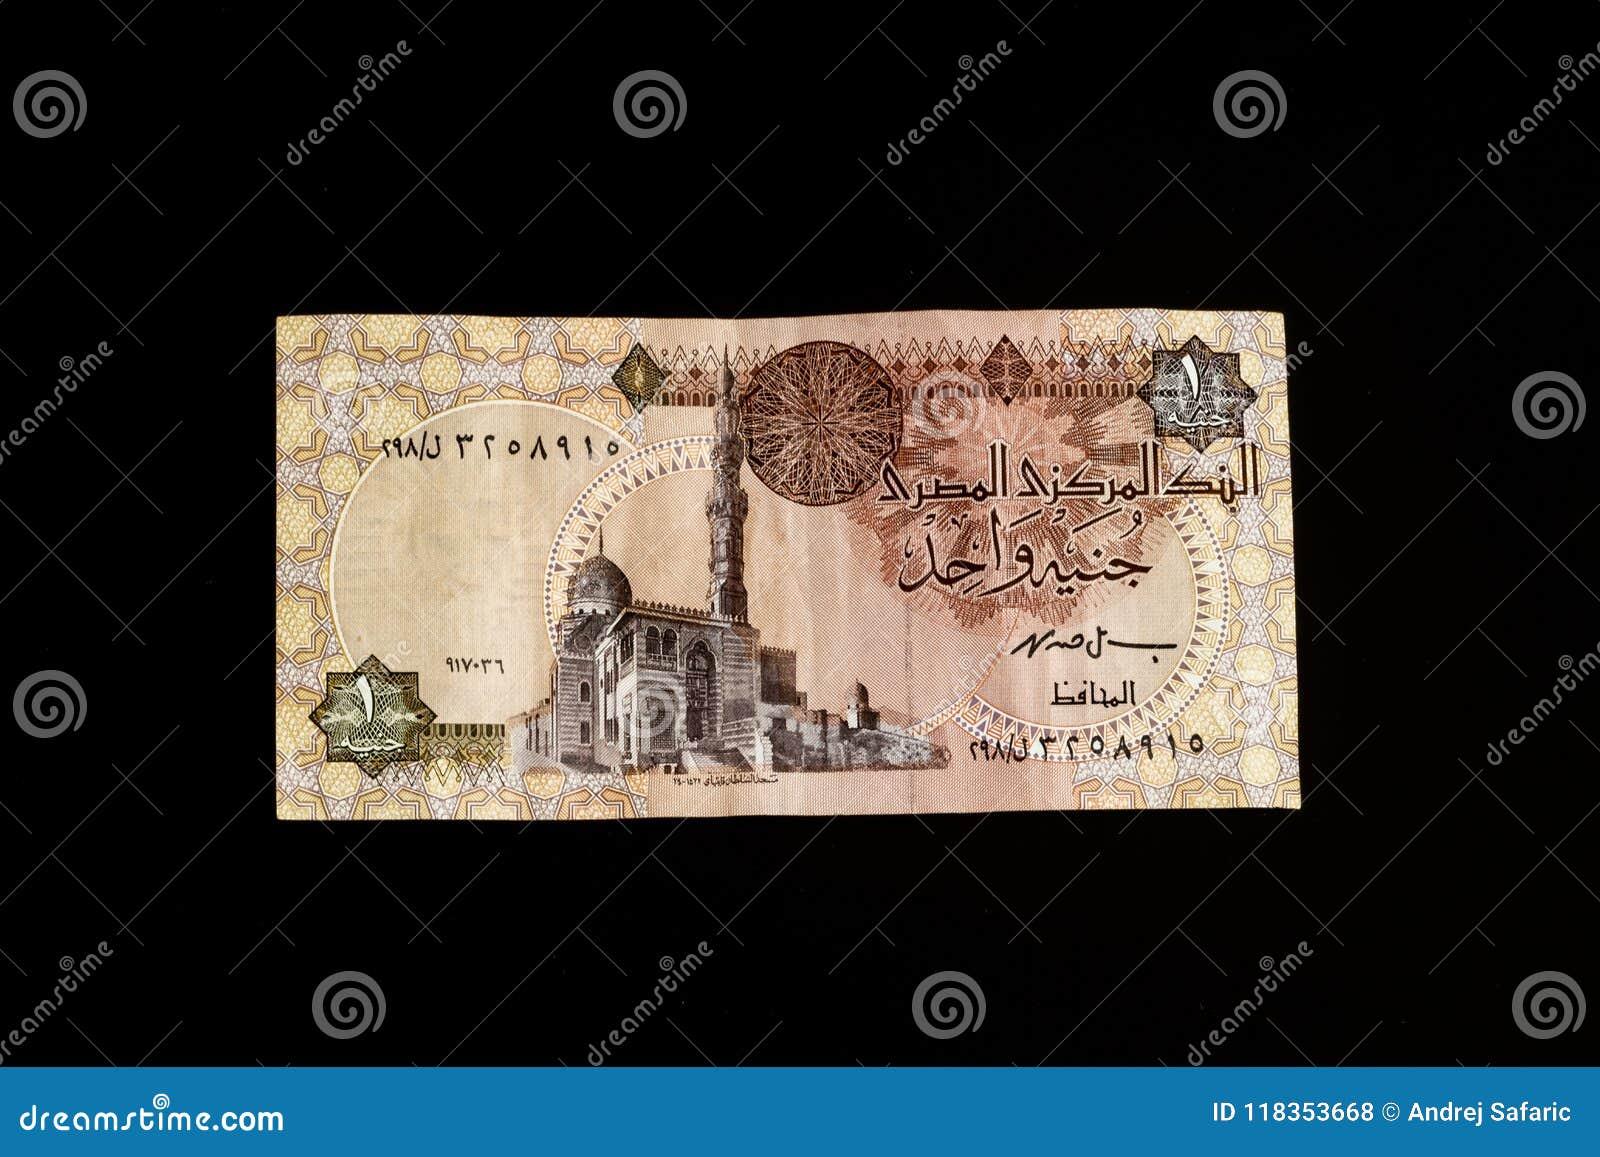 Egyptisch bankbiljet, Tempel van Ramses II in Abu Simbel, één Egyptisch Pond